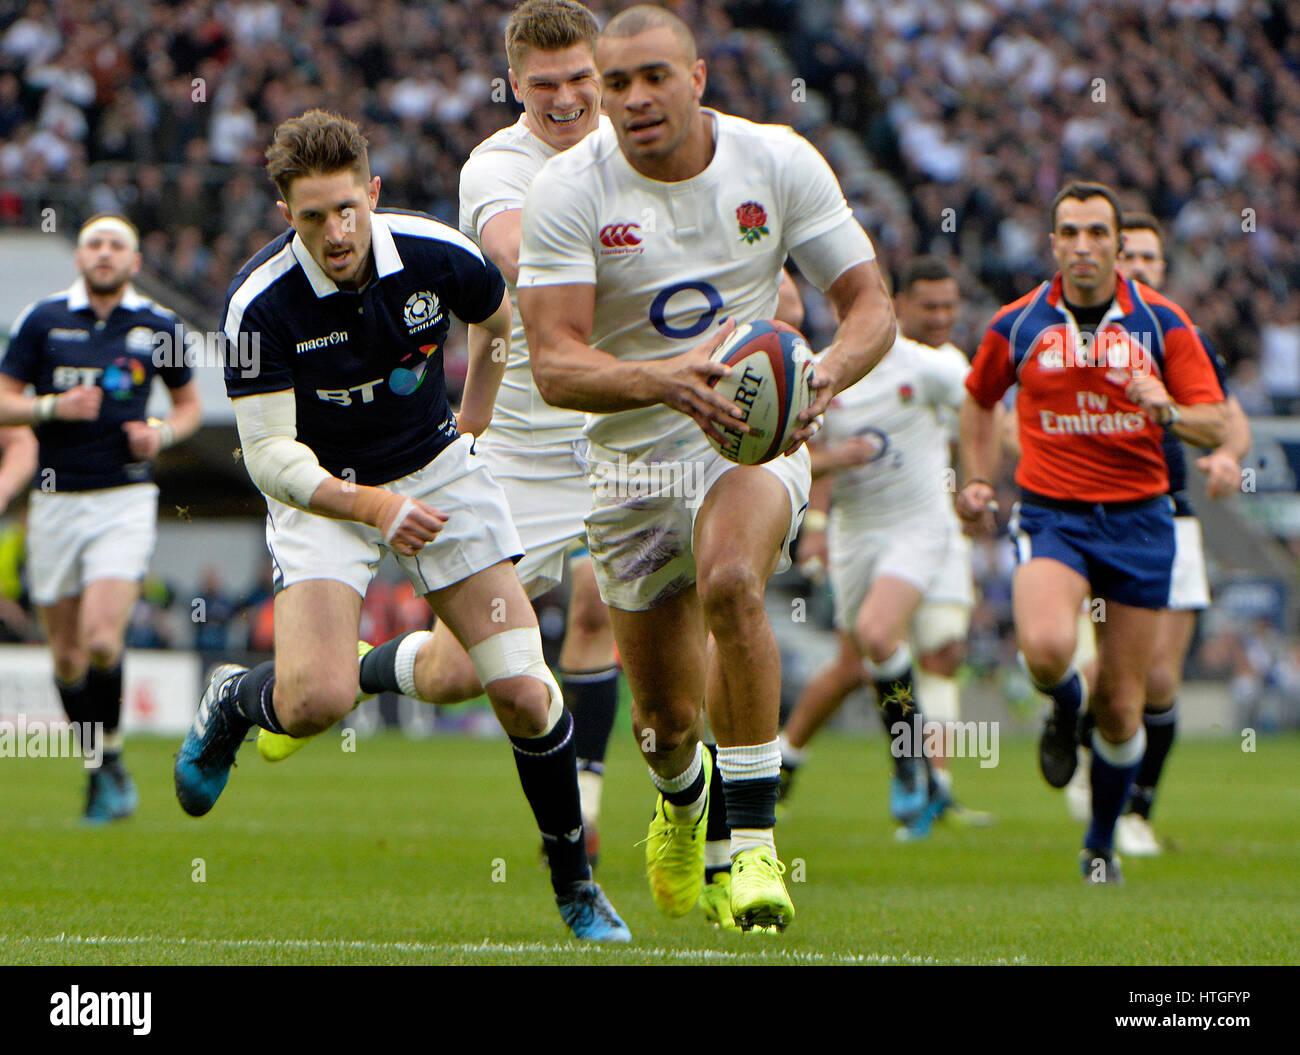 Twickenham Stadium, London, UK. 11th March 2017. Six Nations International Rugby England Vs Scotland at RFU Twickenham - Stock Image